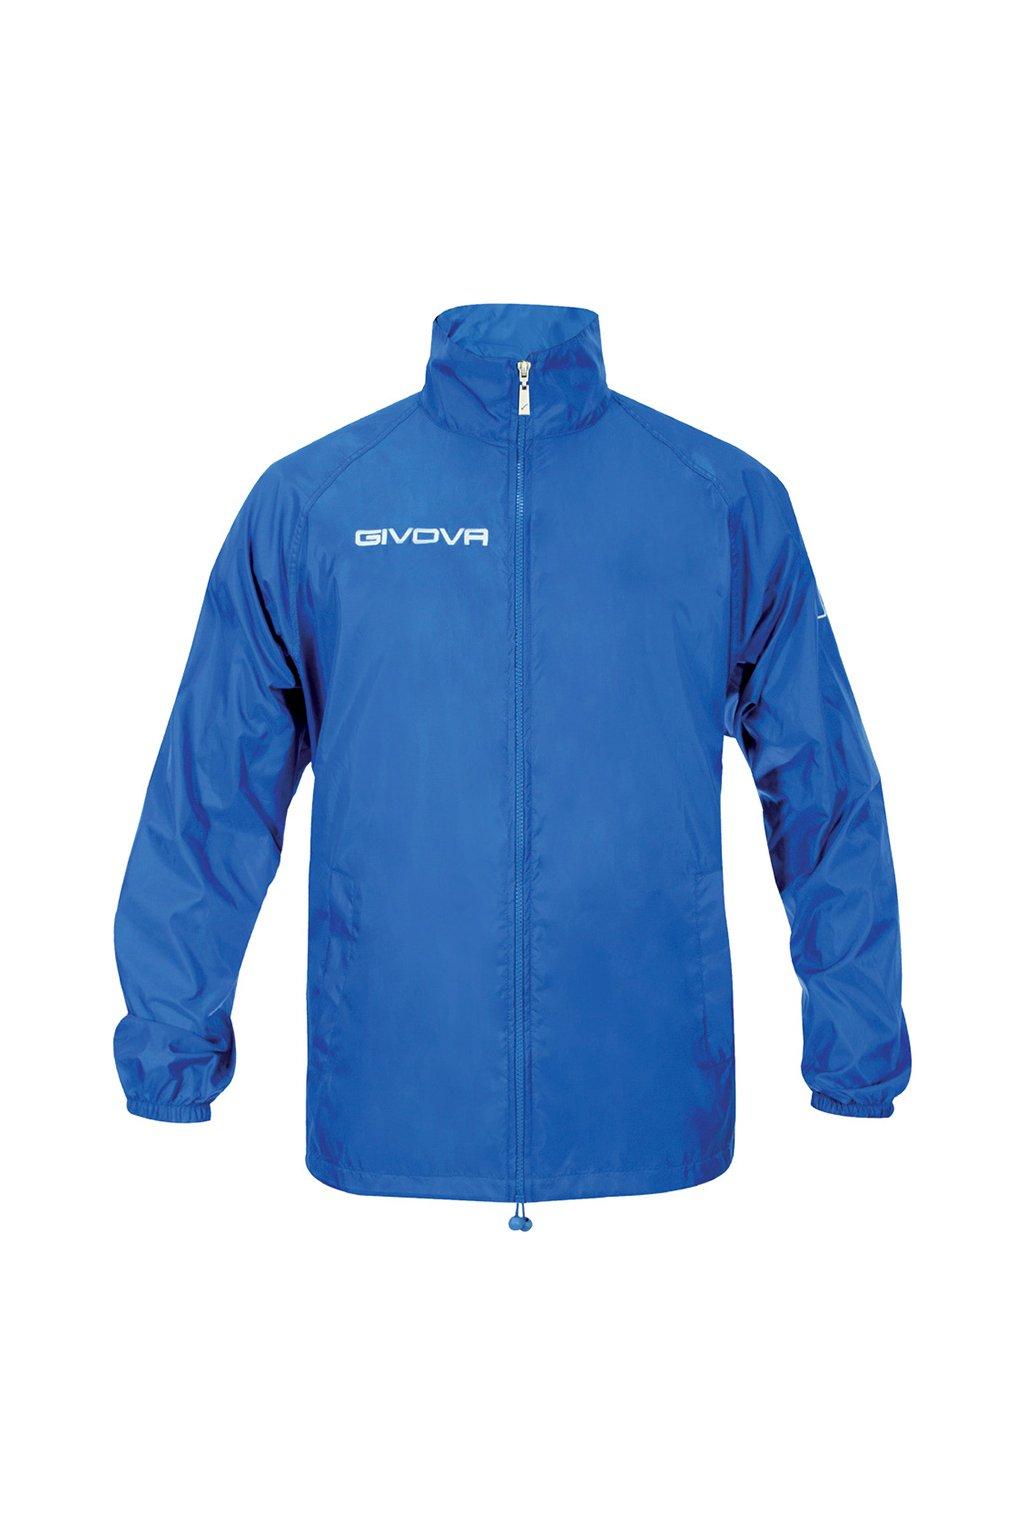 Bunda Givova Rain Basico modrá RJ001 0002